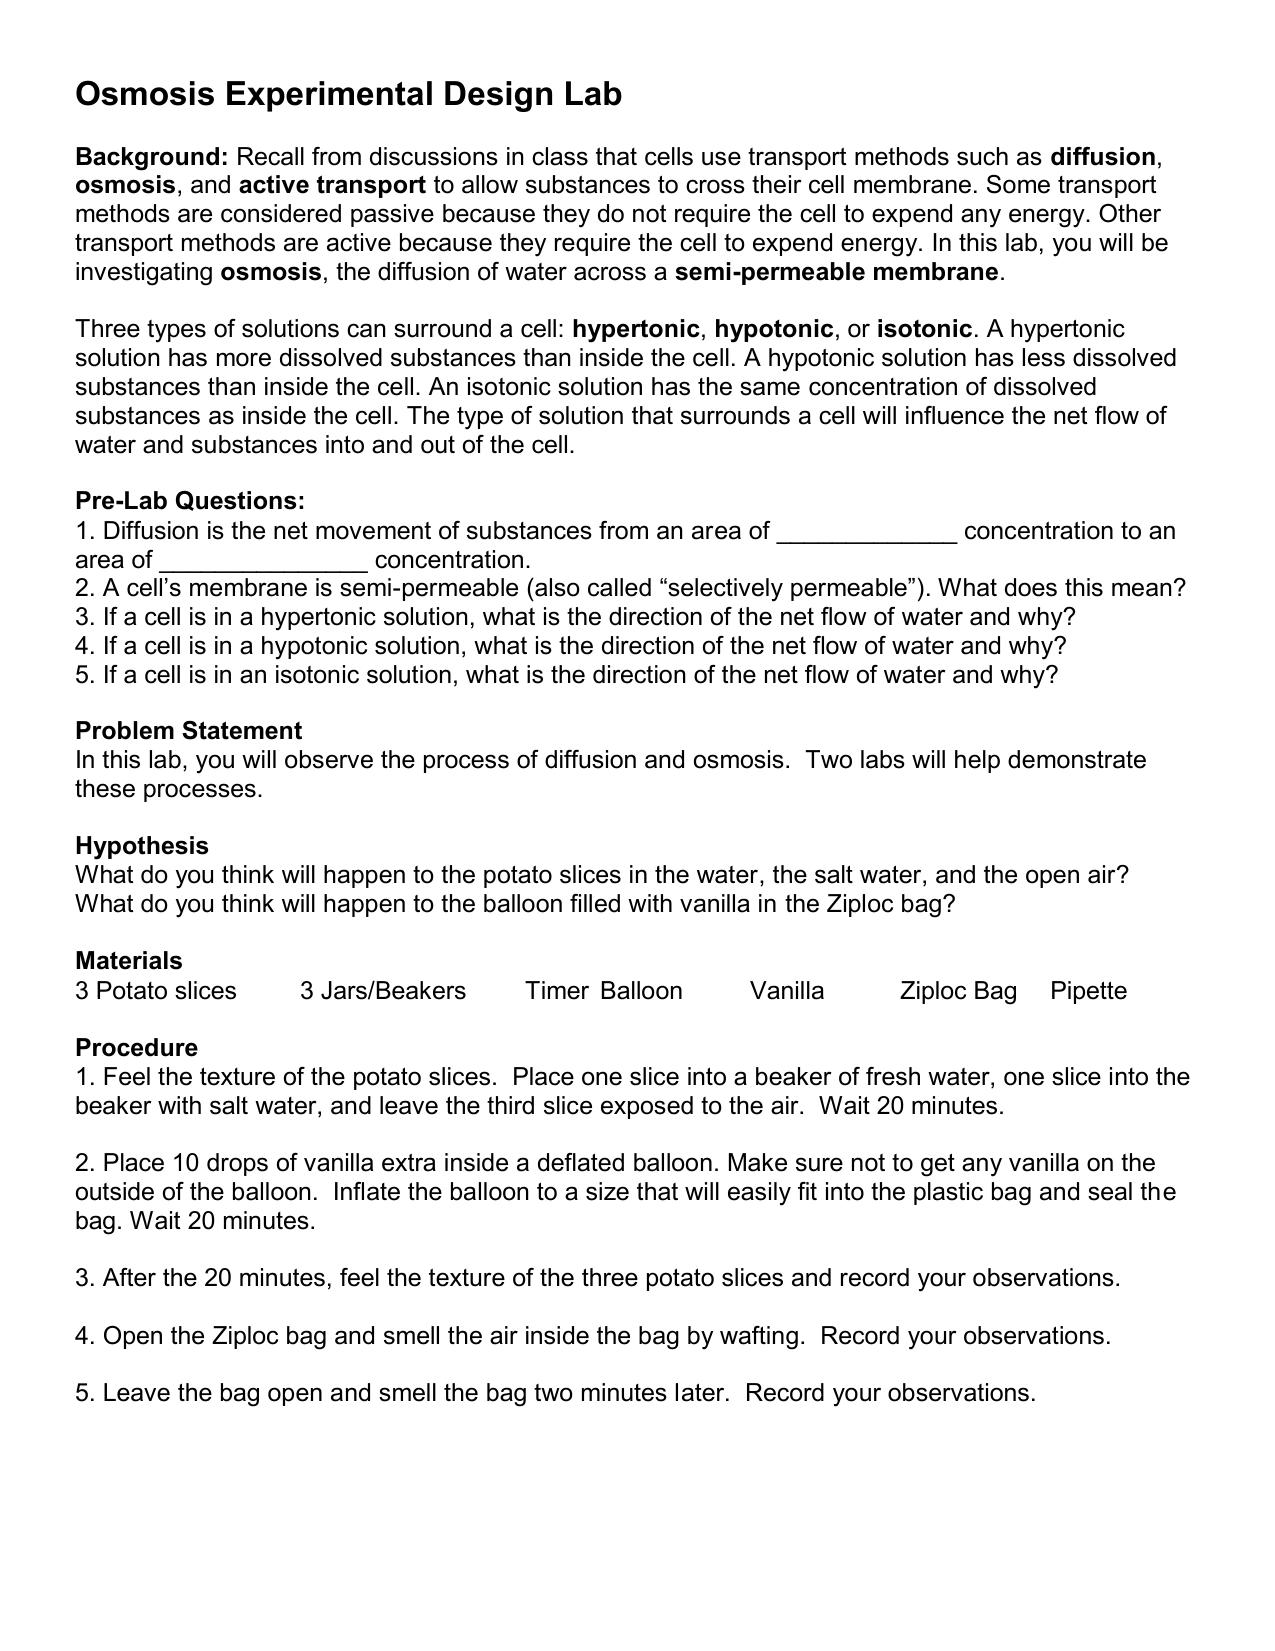 osmosis potato experiment lab report